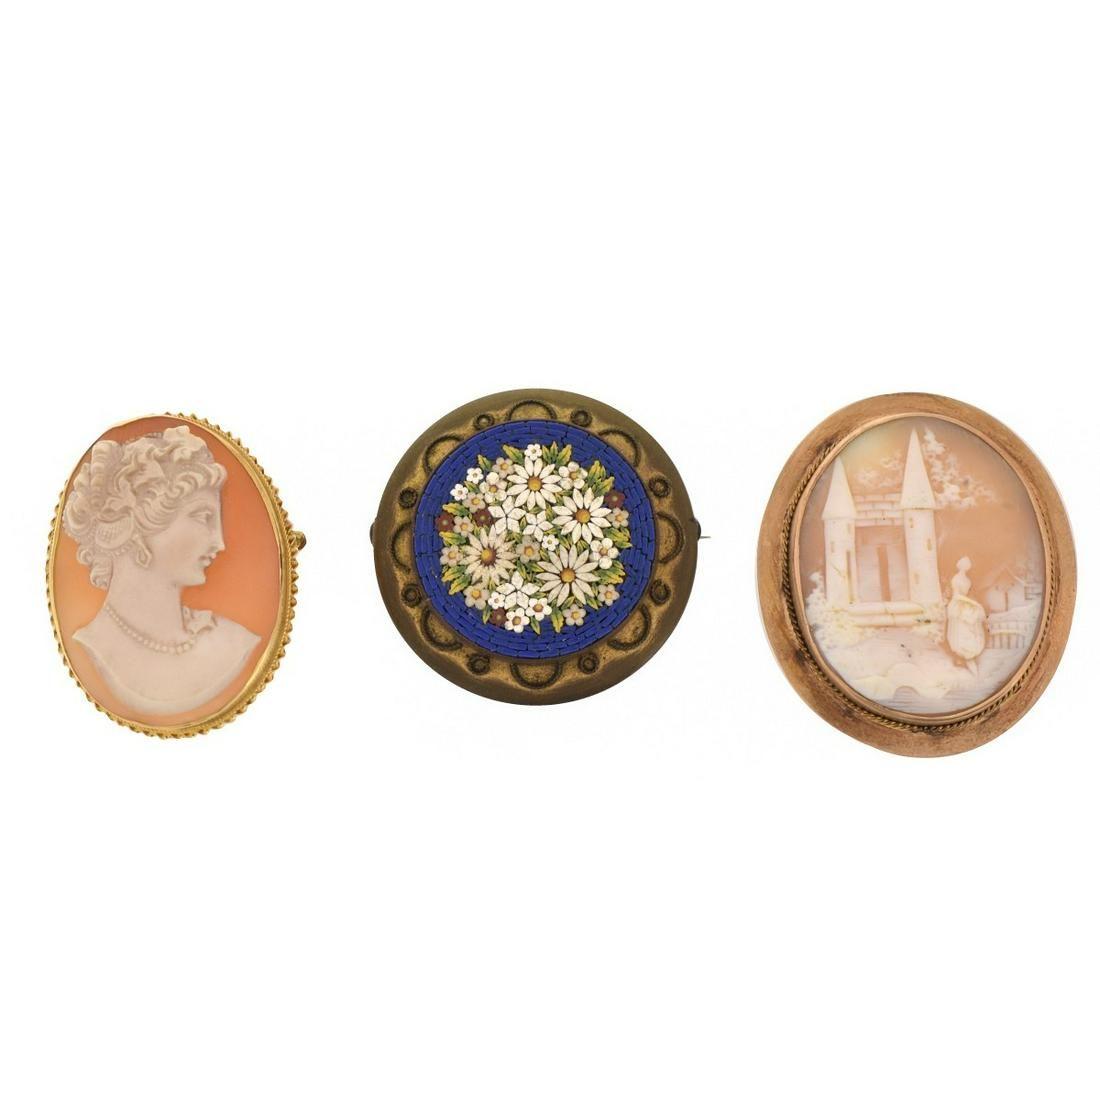 Three Antique Pins